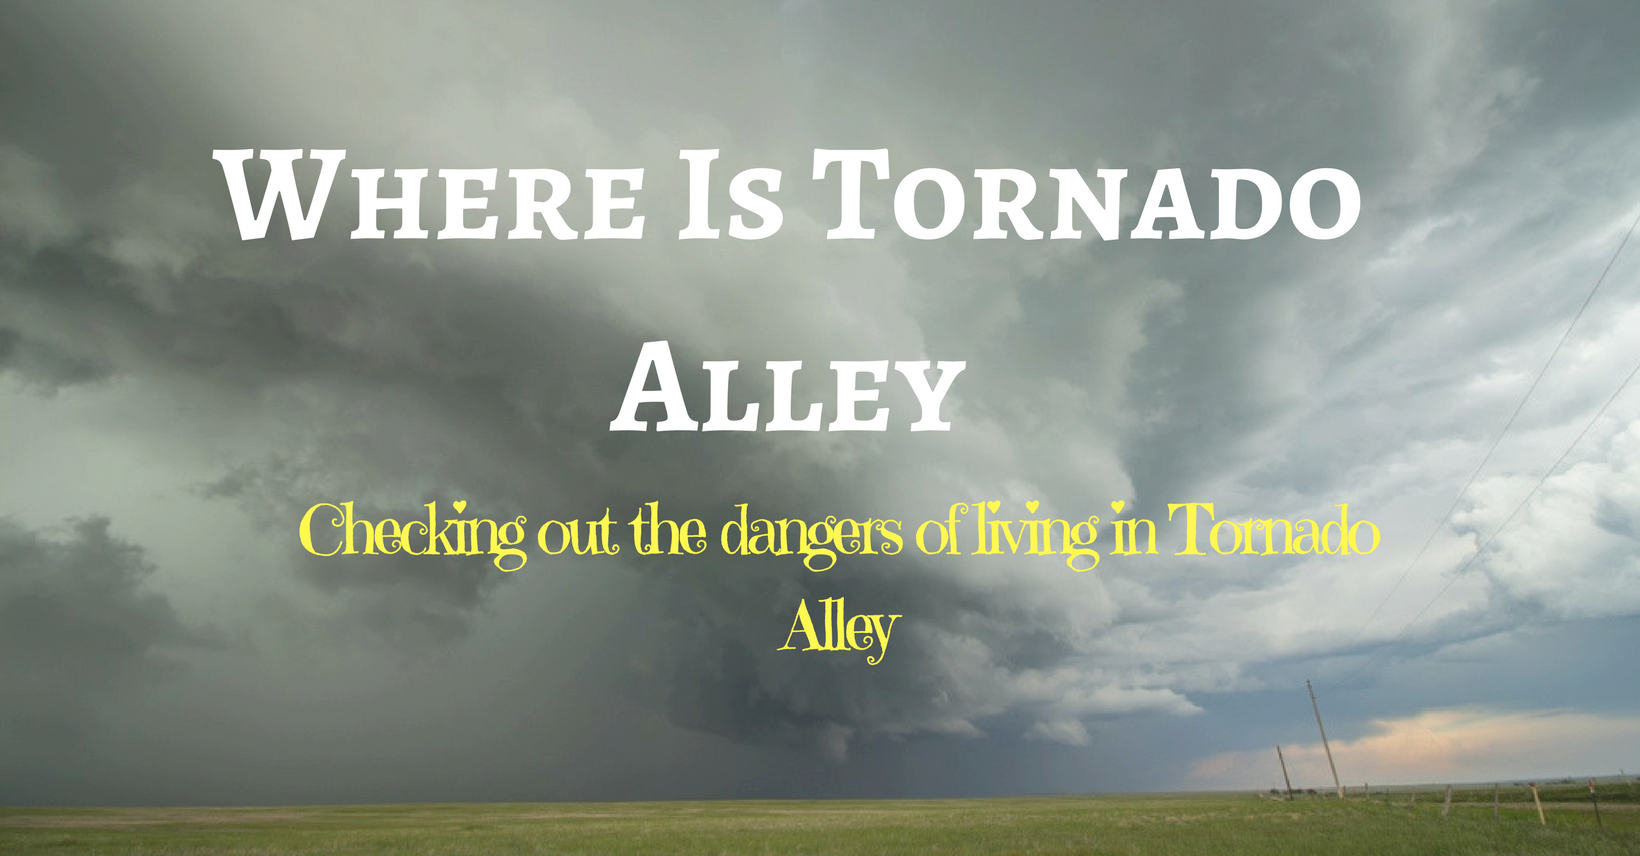 Tornado Alley Season Starts-So What About It?